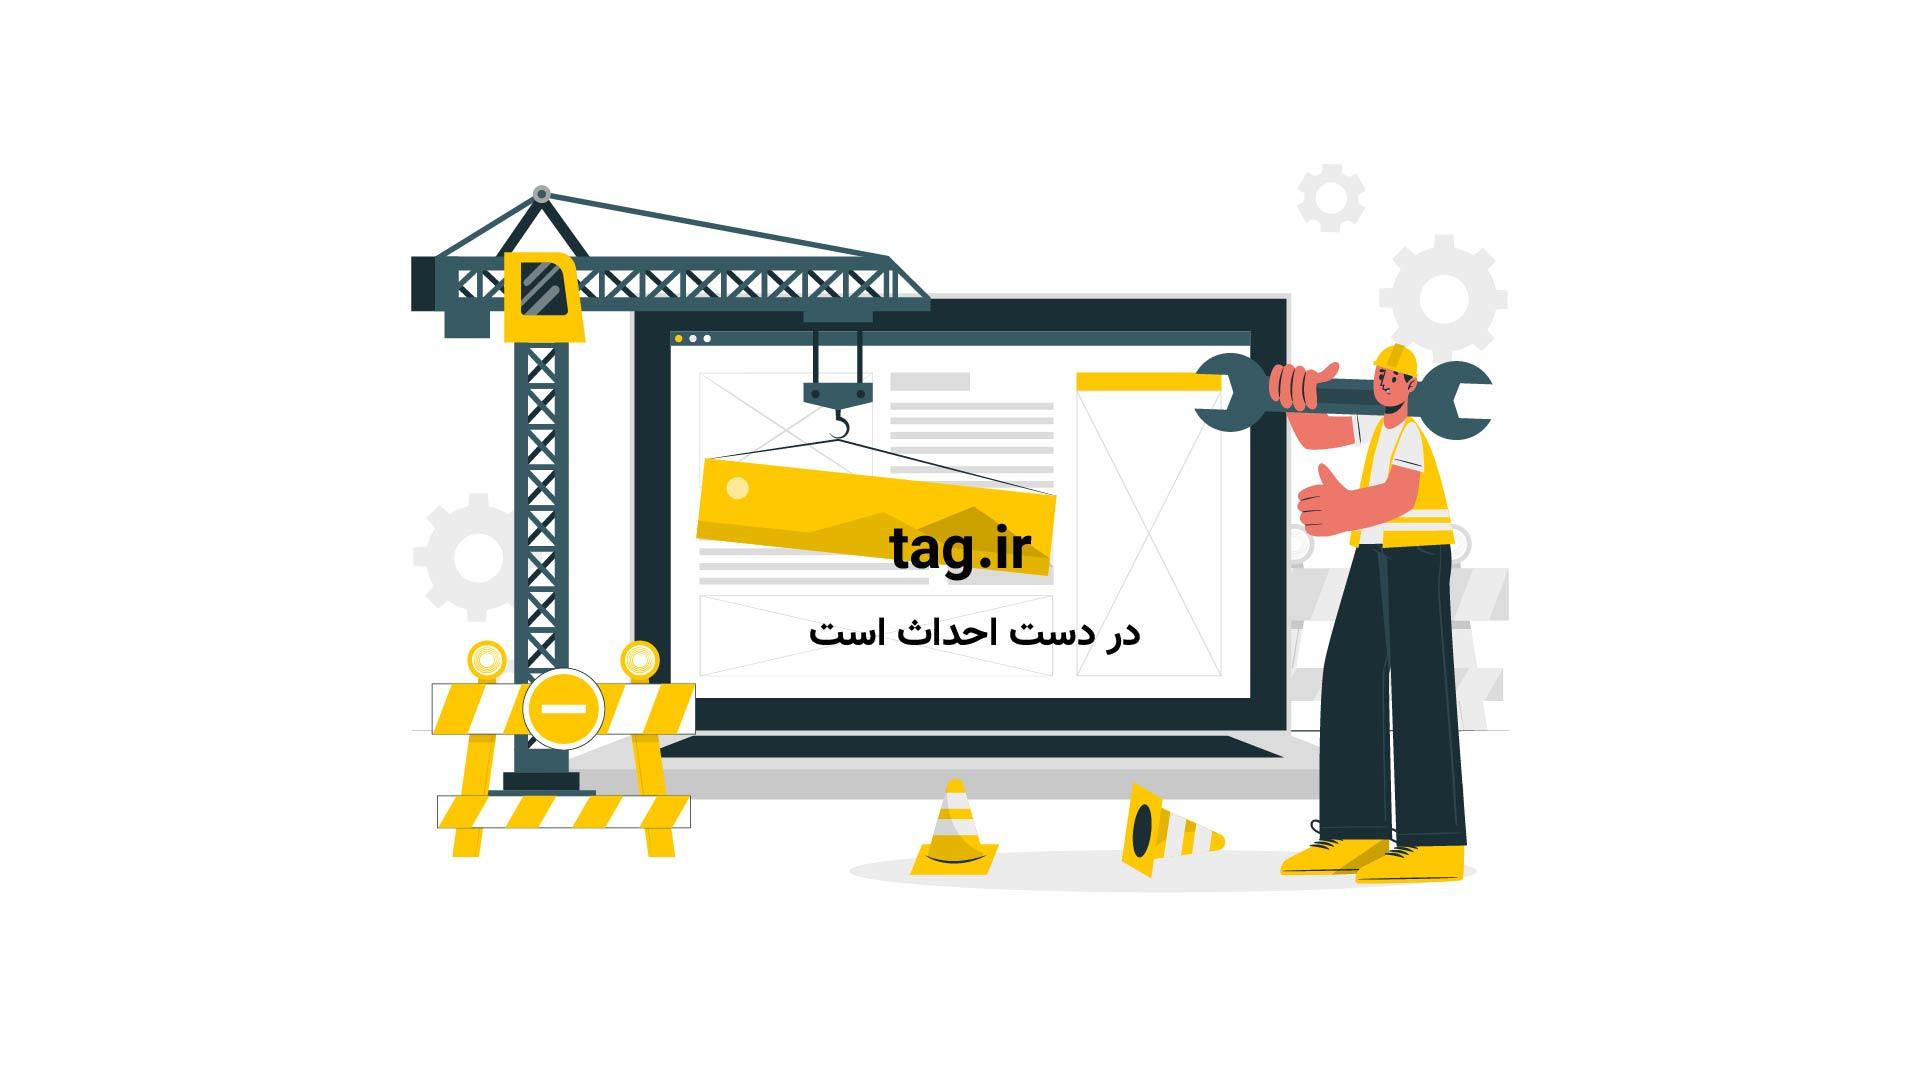 سکانس ماندگار فیلم محمد رسول الله؛ لحظه اعلام علنی اسلام و ورود باشکوه حمزه | فیلم